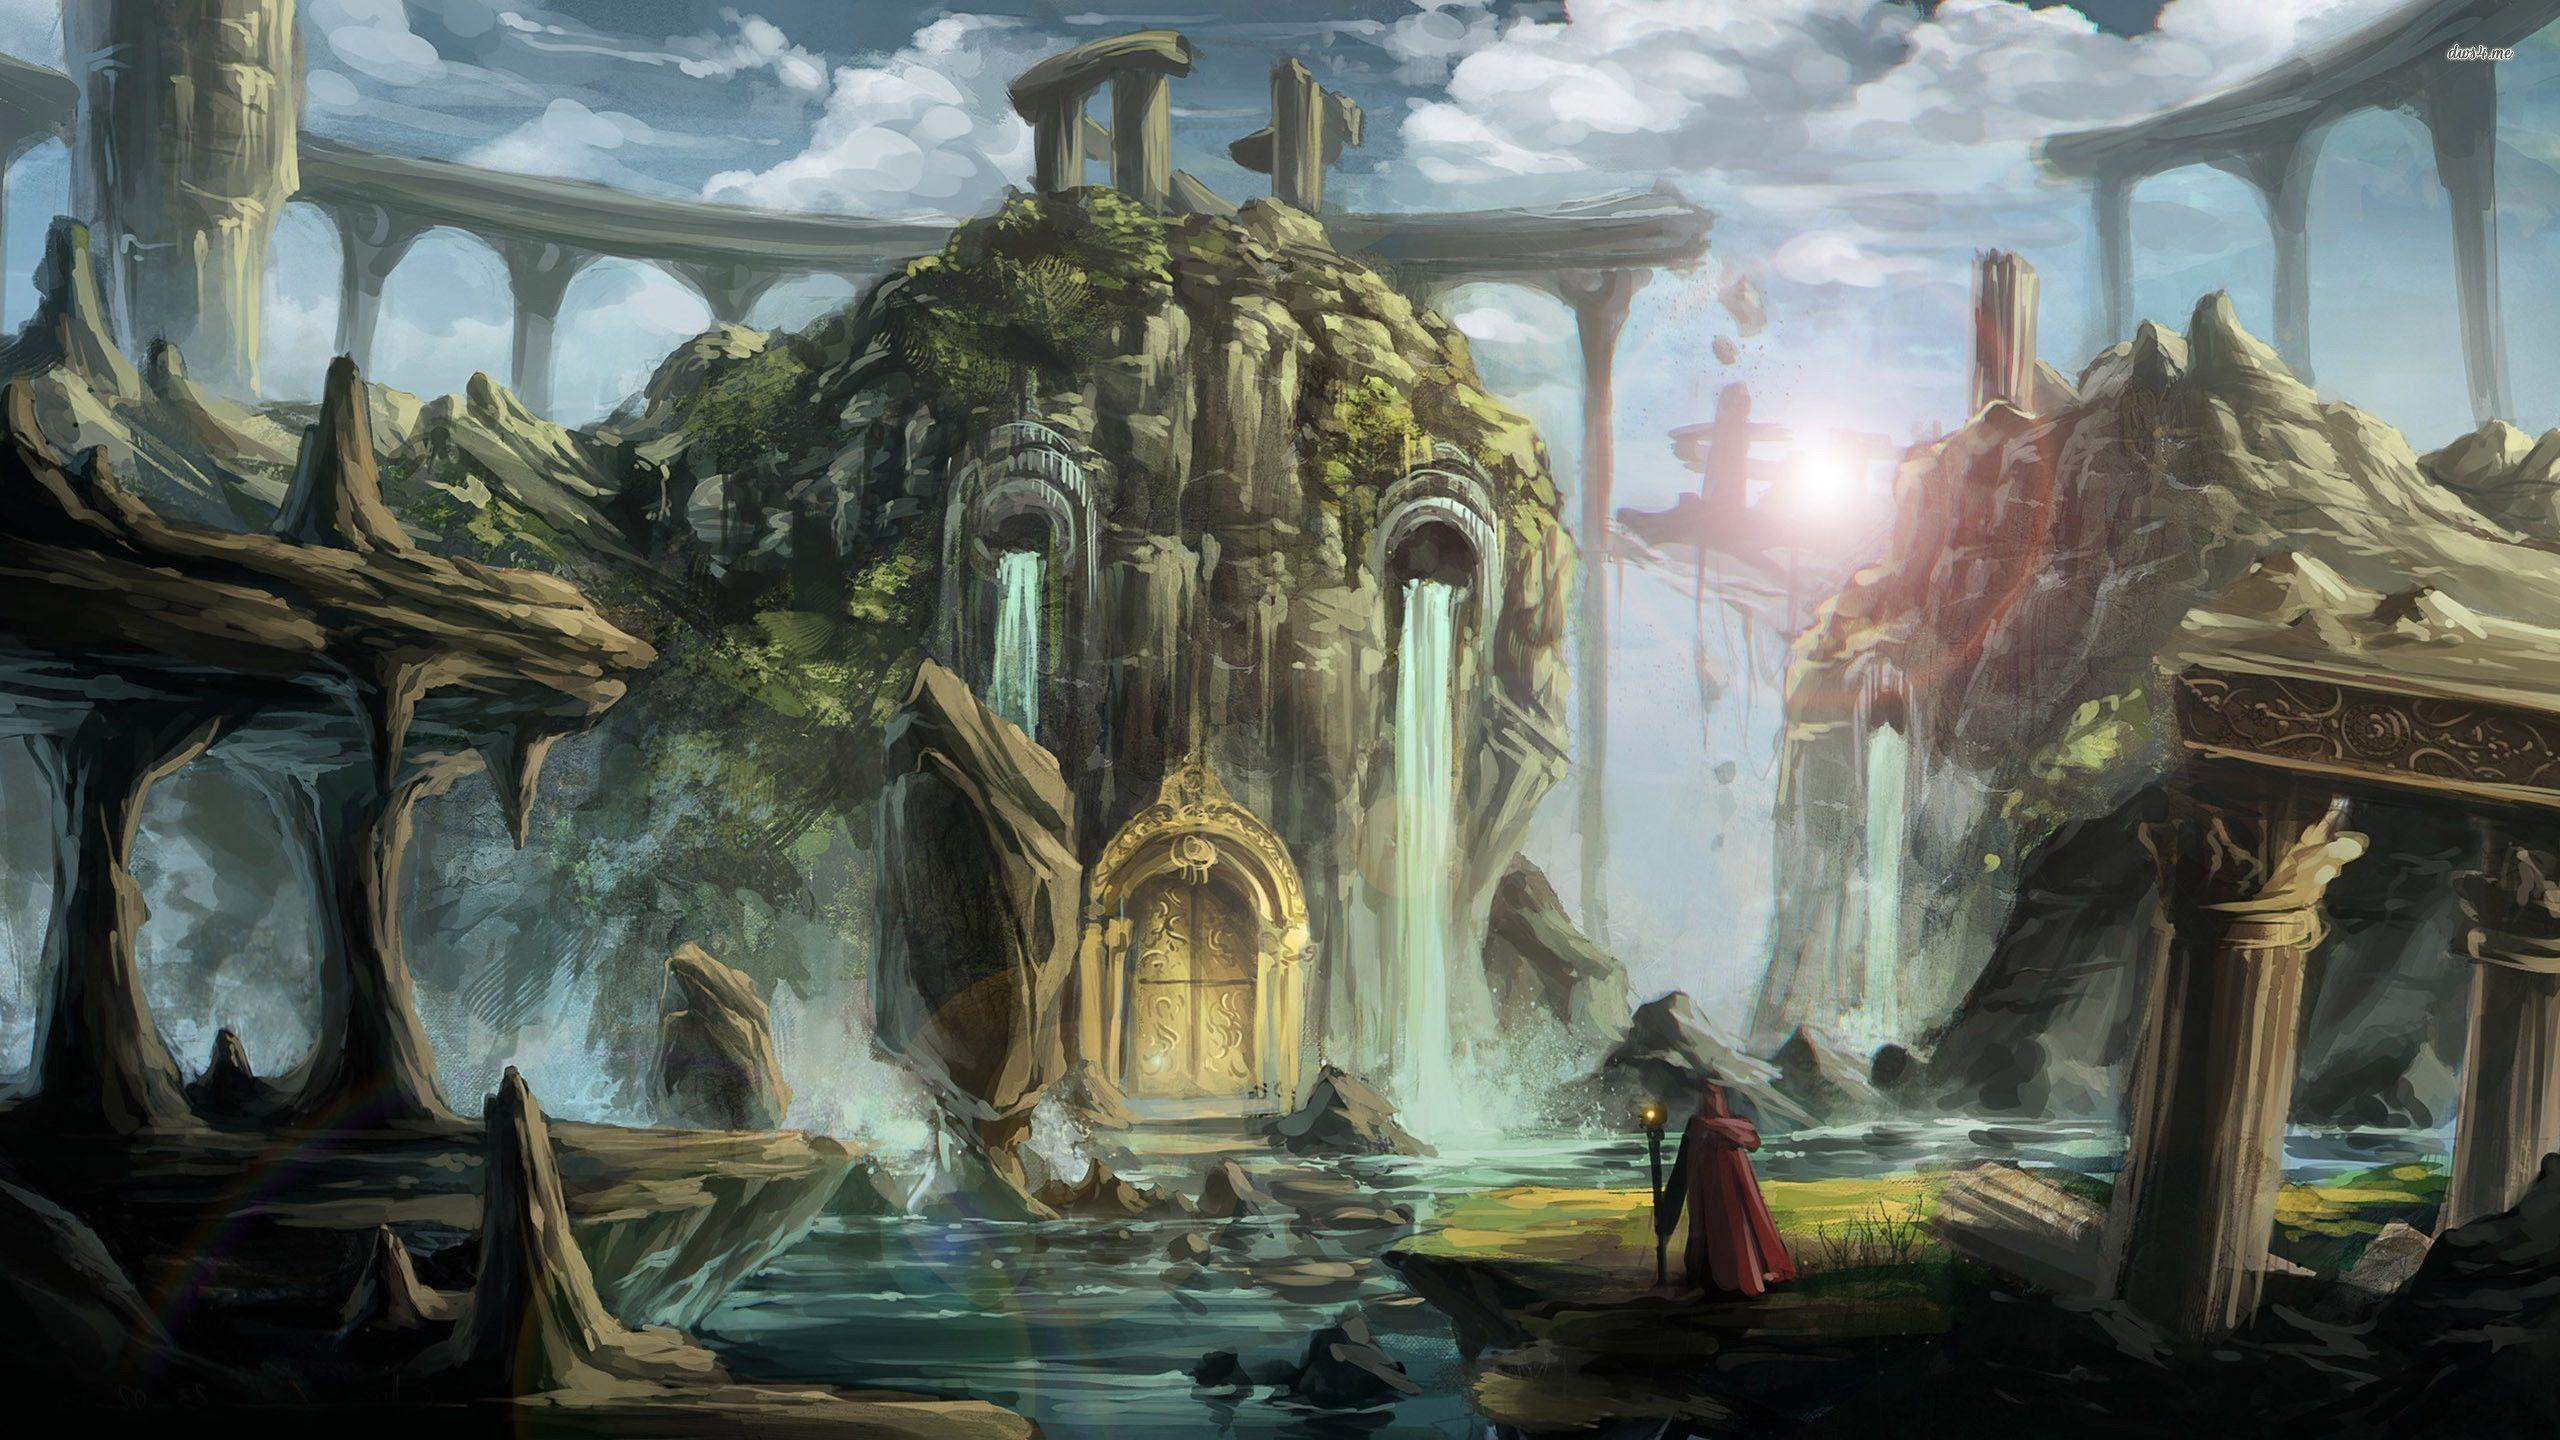 magic castle fantasy world - photo #23